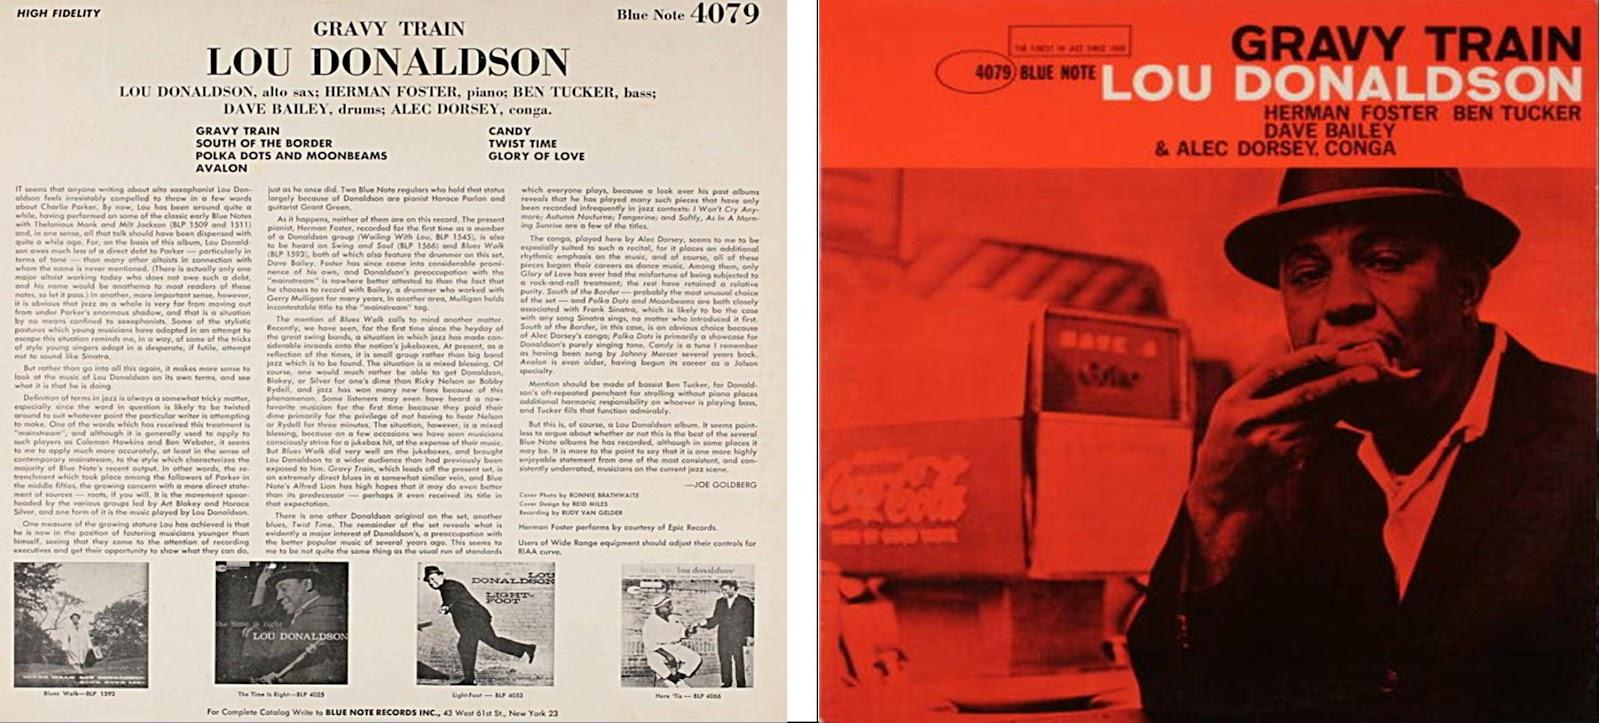 Lou Donaldson Gravy Train